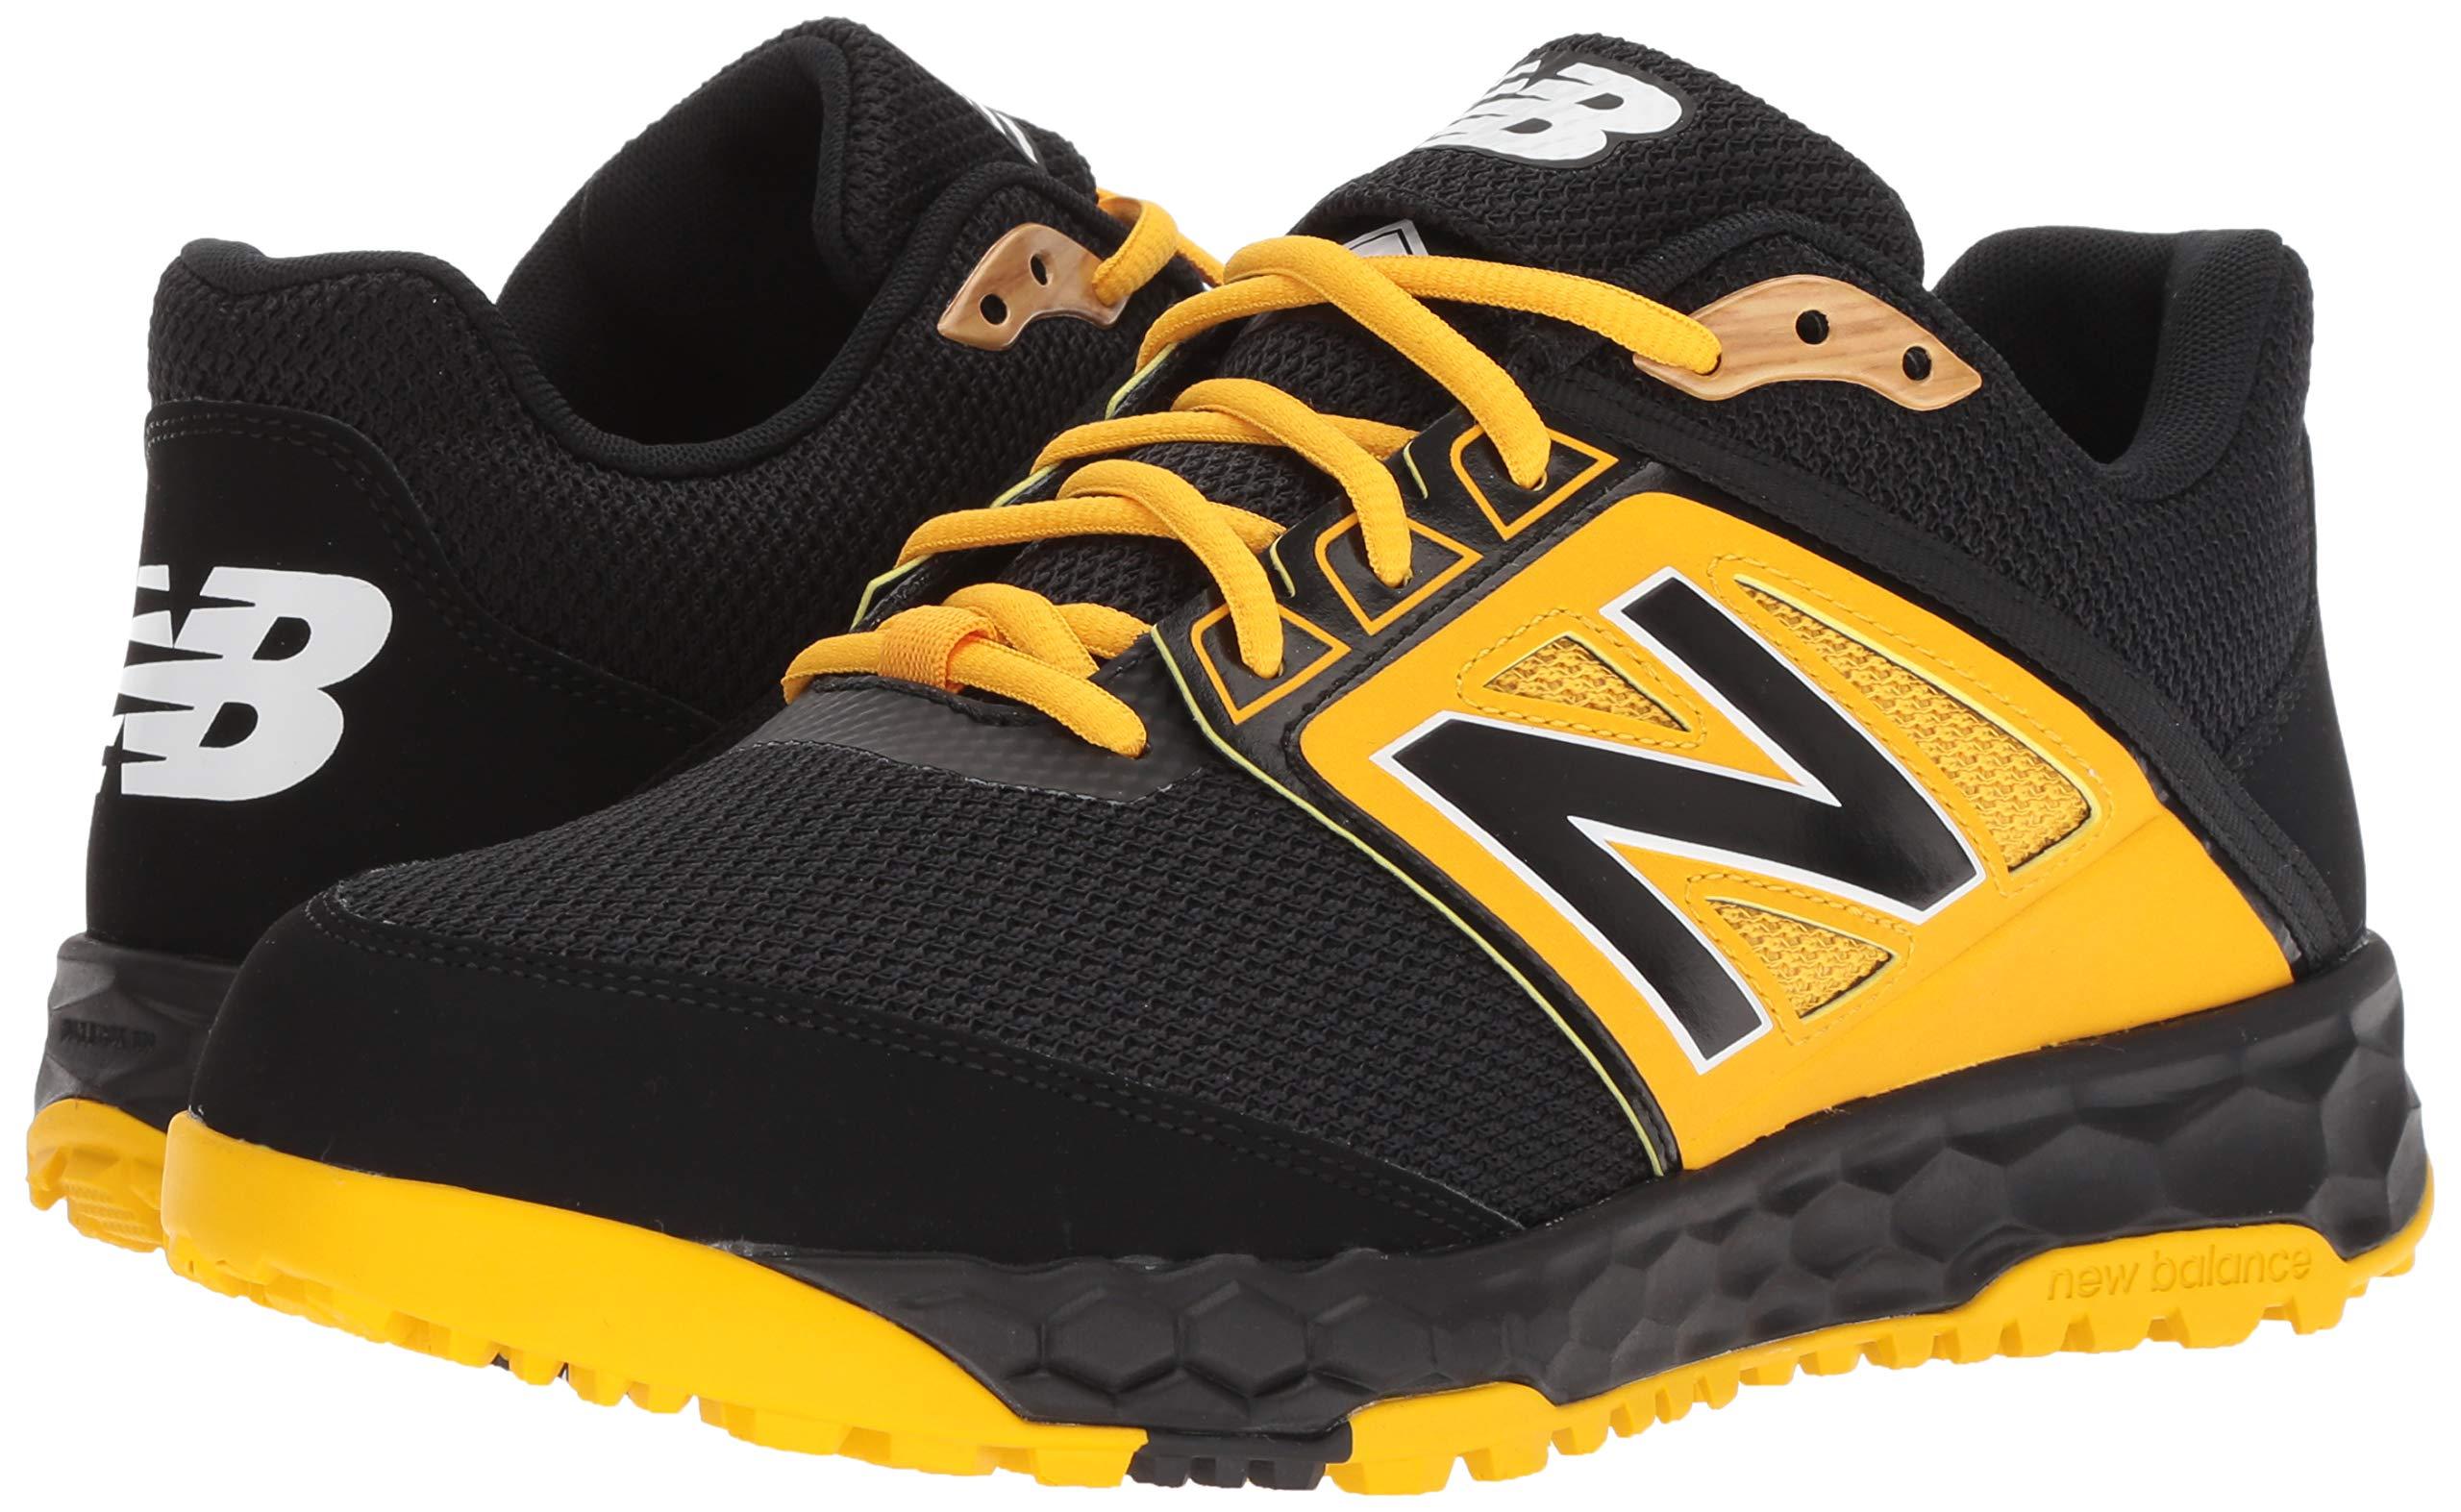 New Balance Men's 3000v4 Turf Baseball Shoe, Black/Yellow, 5 D US by New Balance (Image #6)